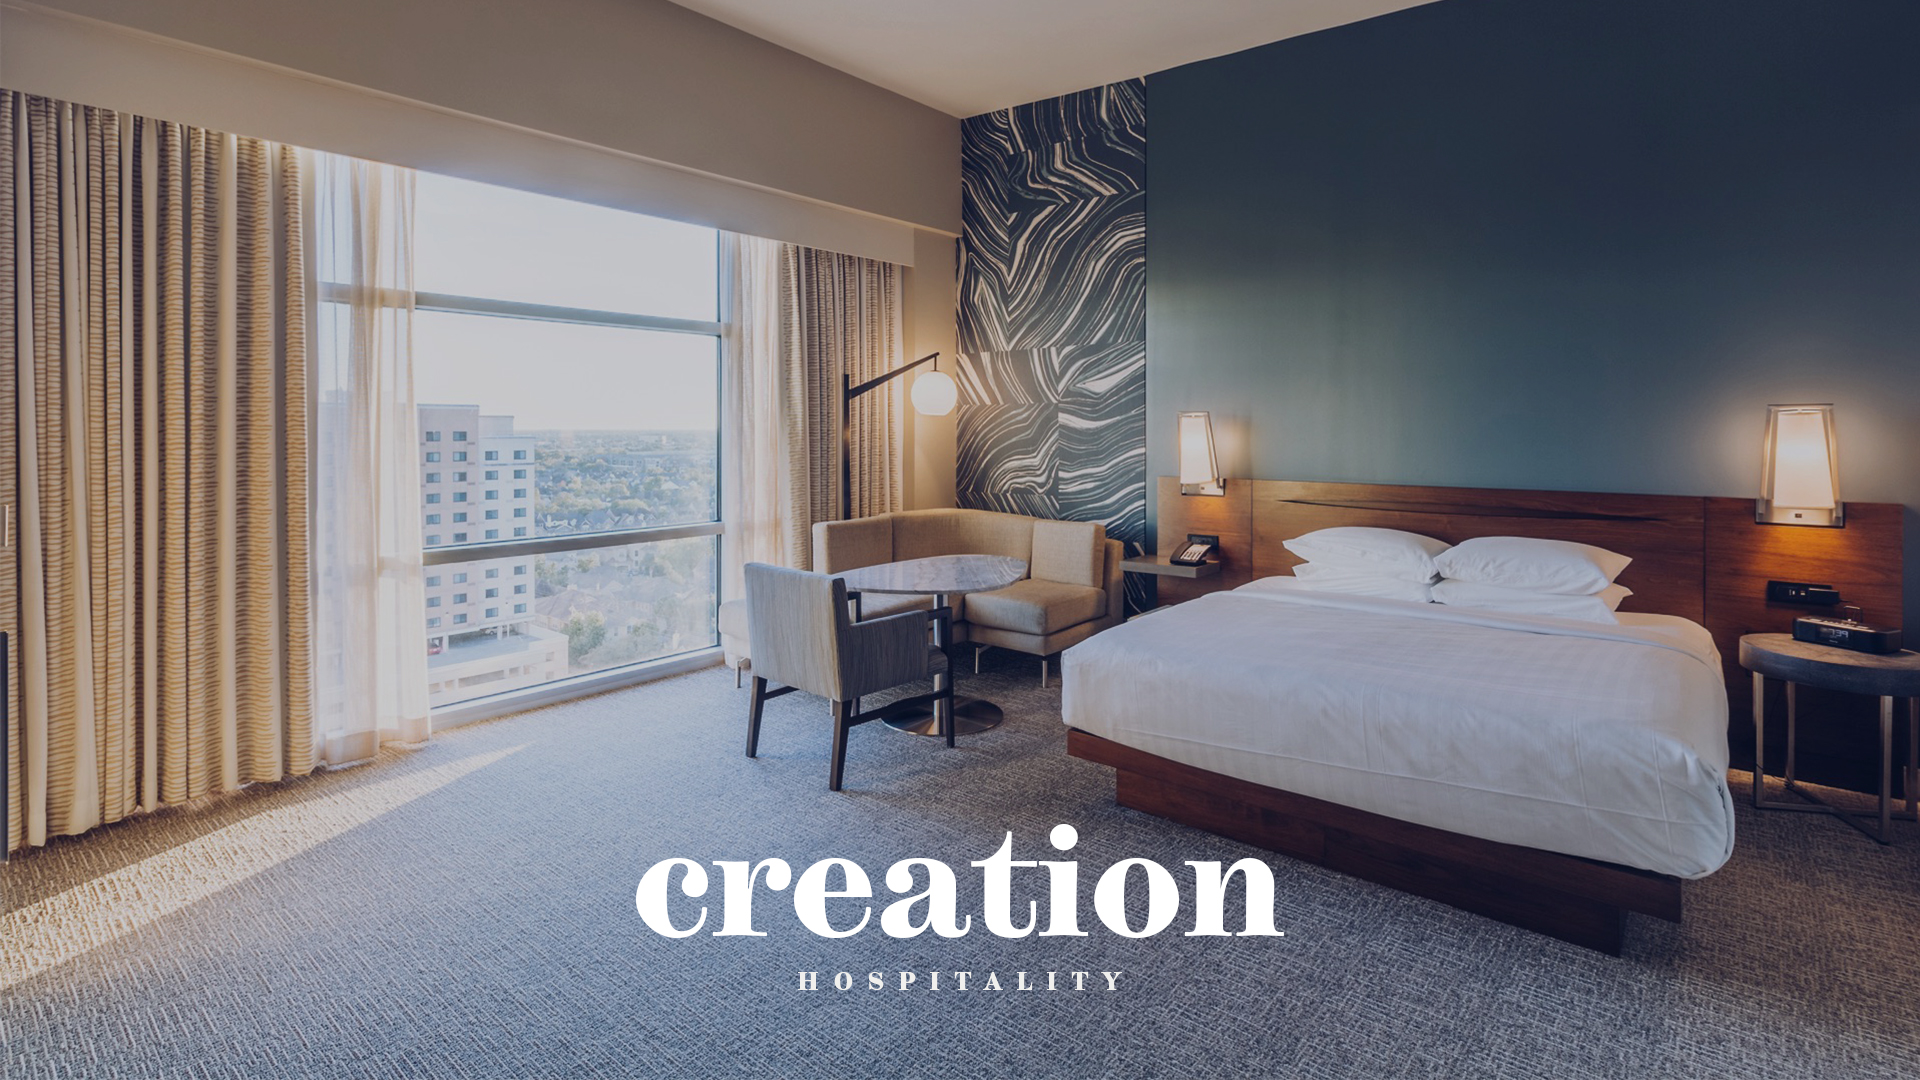 Creation Hospitality Website Design Preview